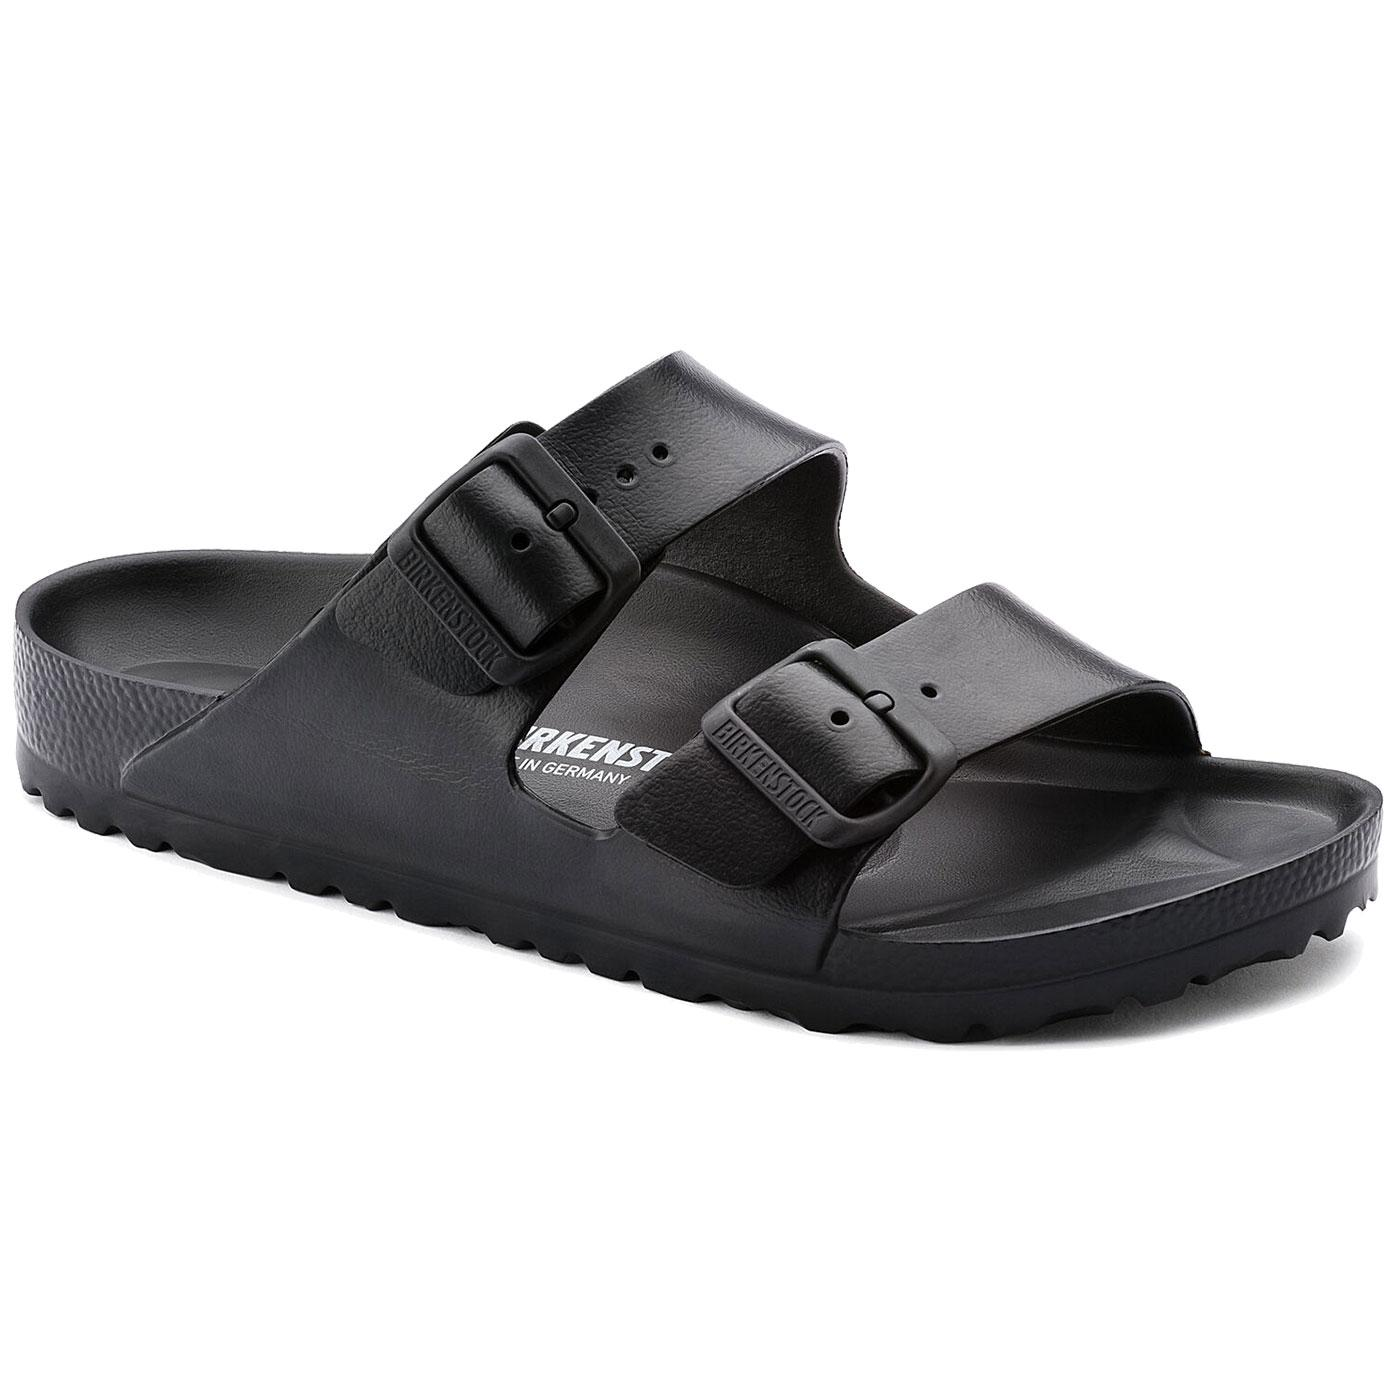 Arizona EVA BIRKENSTOCK Lightweight Sandals BLACK